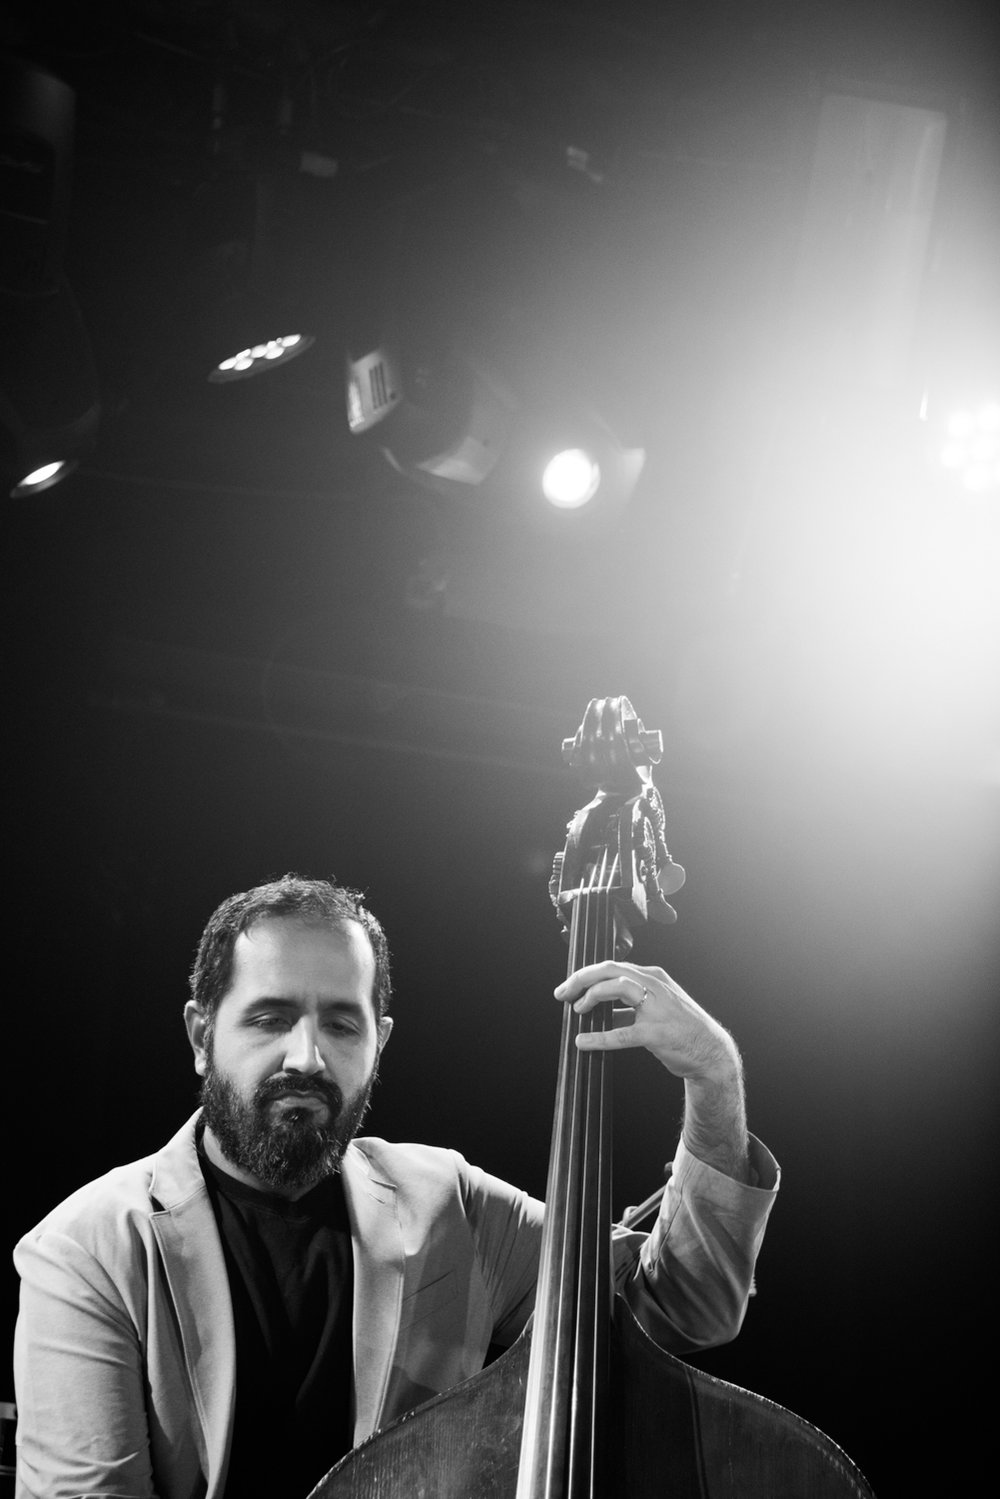 Jorge Roeder, 2017